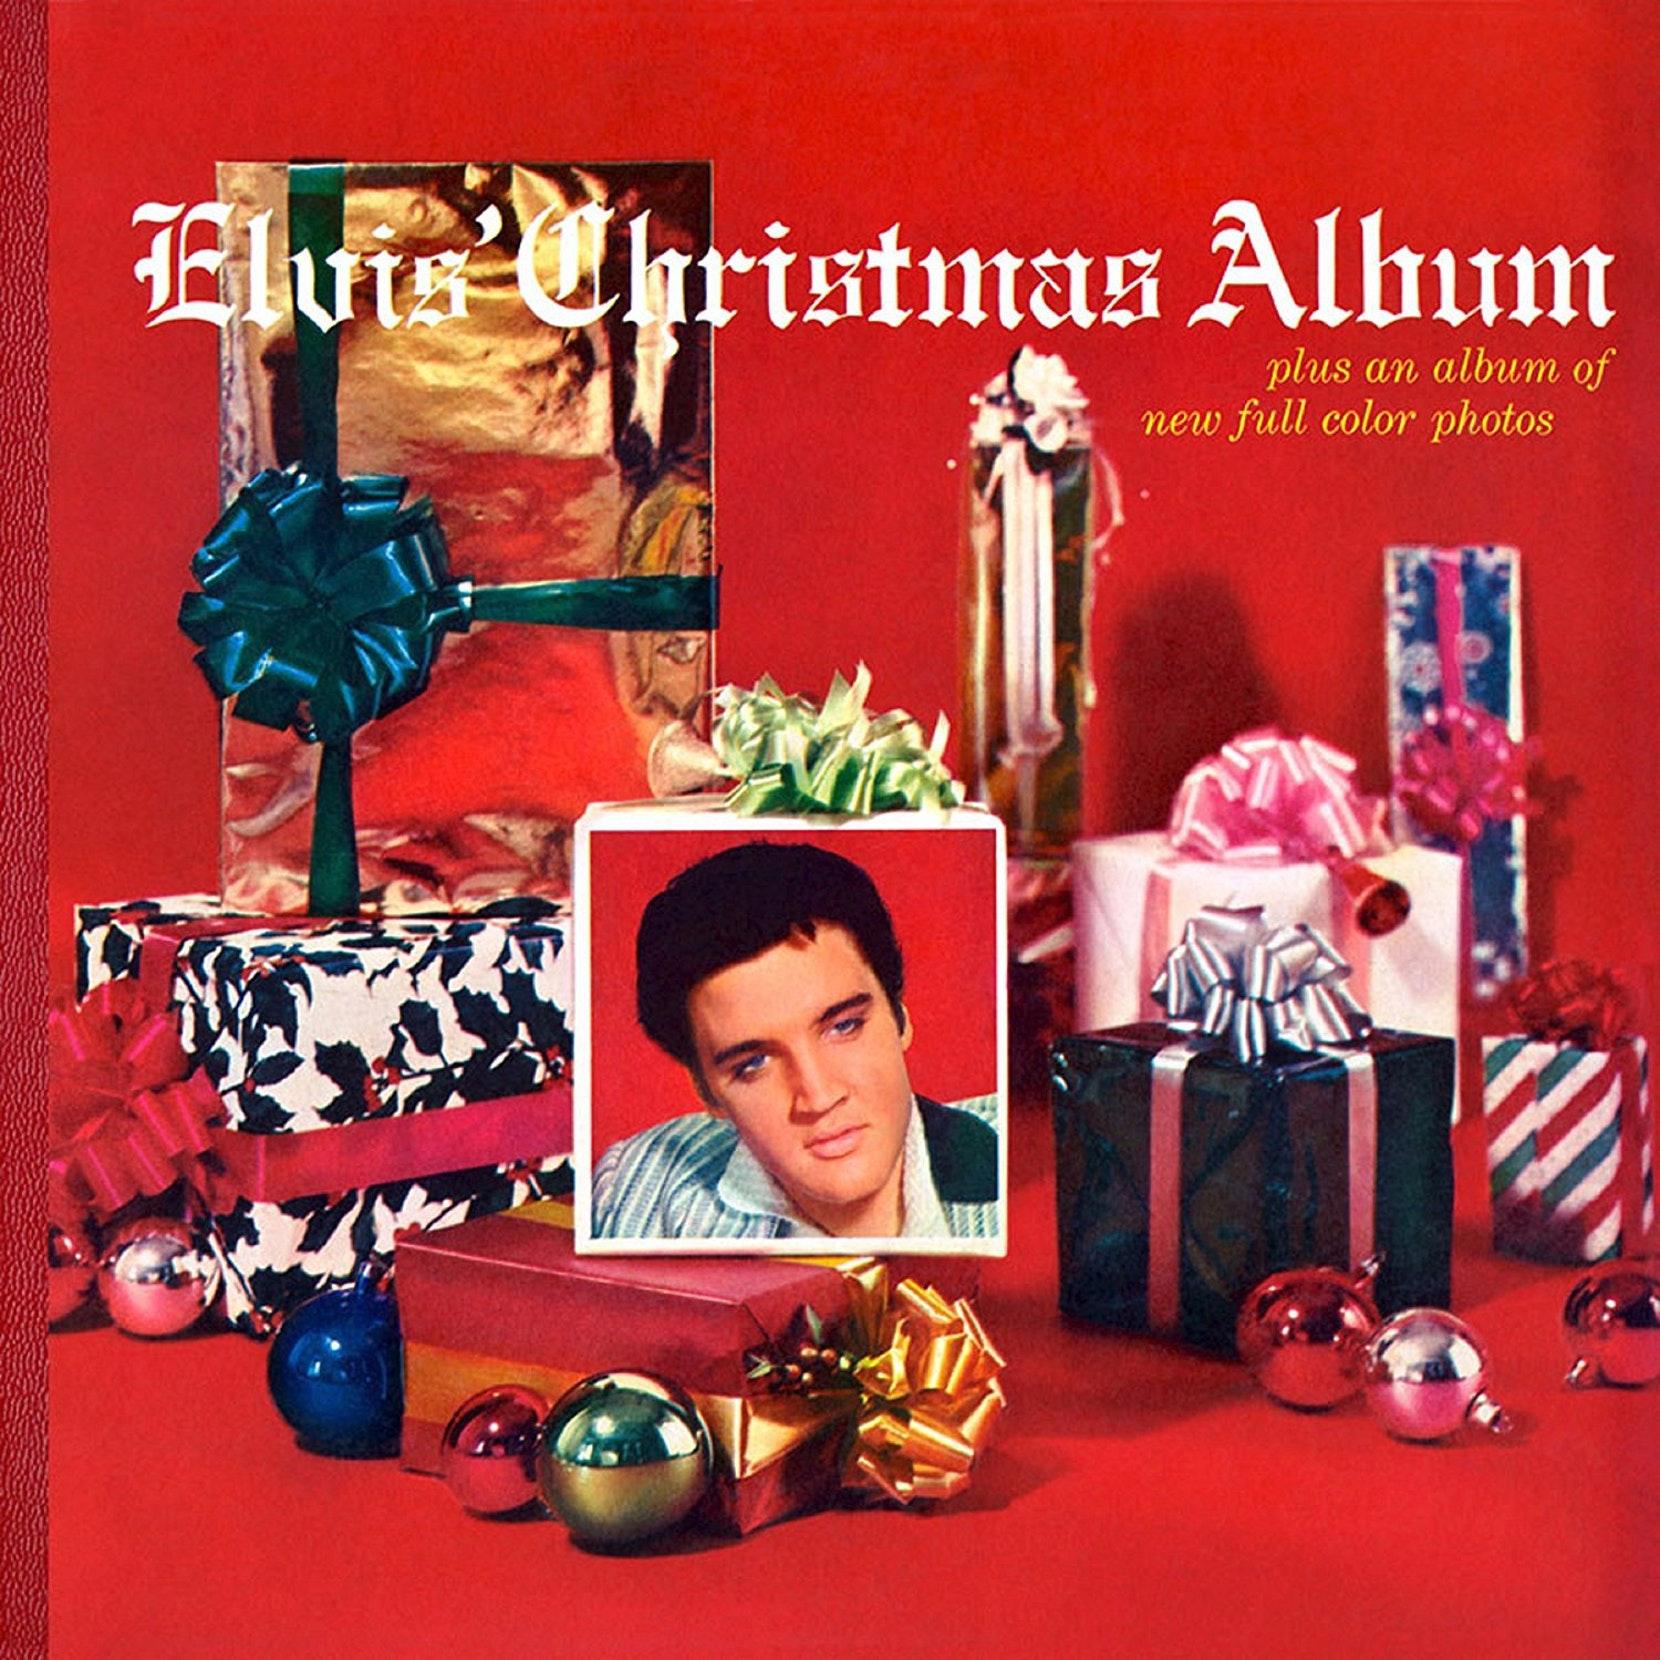 tinhte_christmas_giang_sinh_vinyl_album (8).jpg